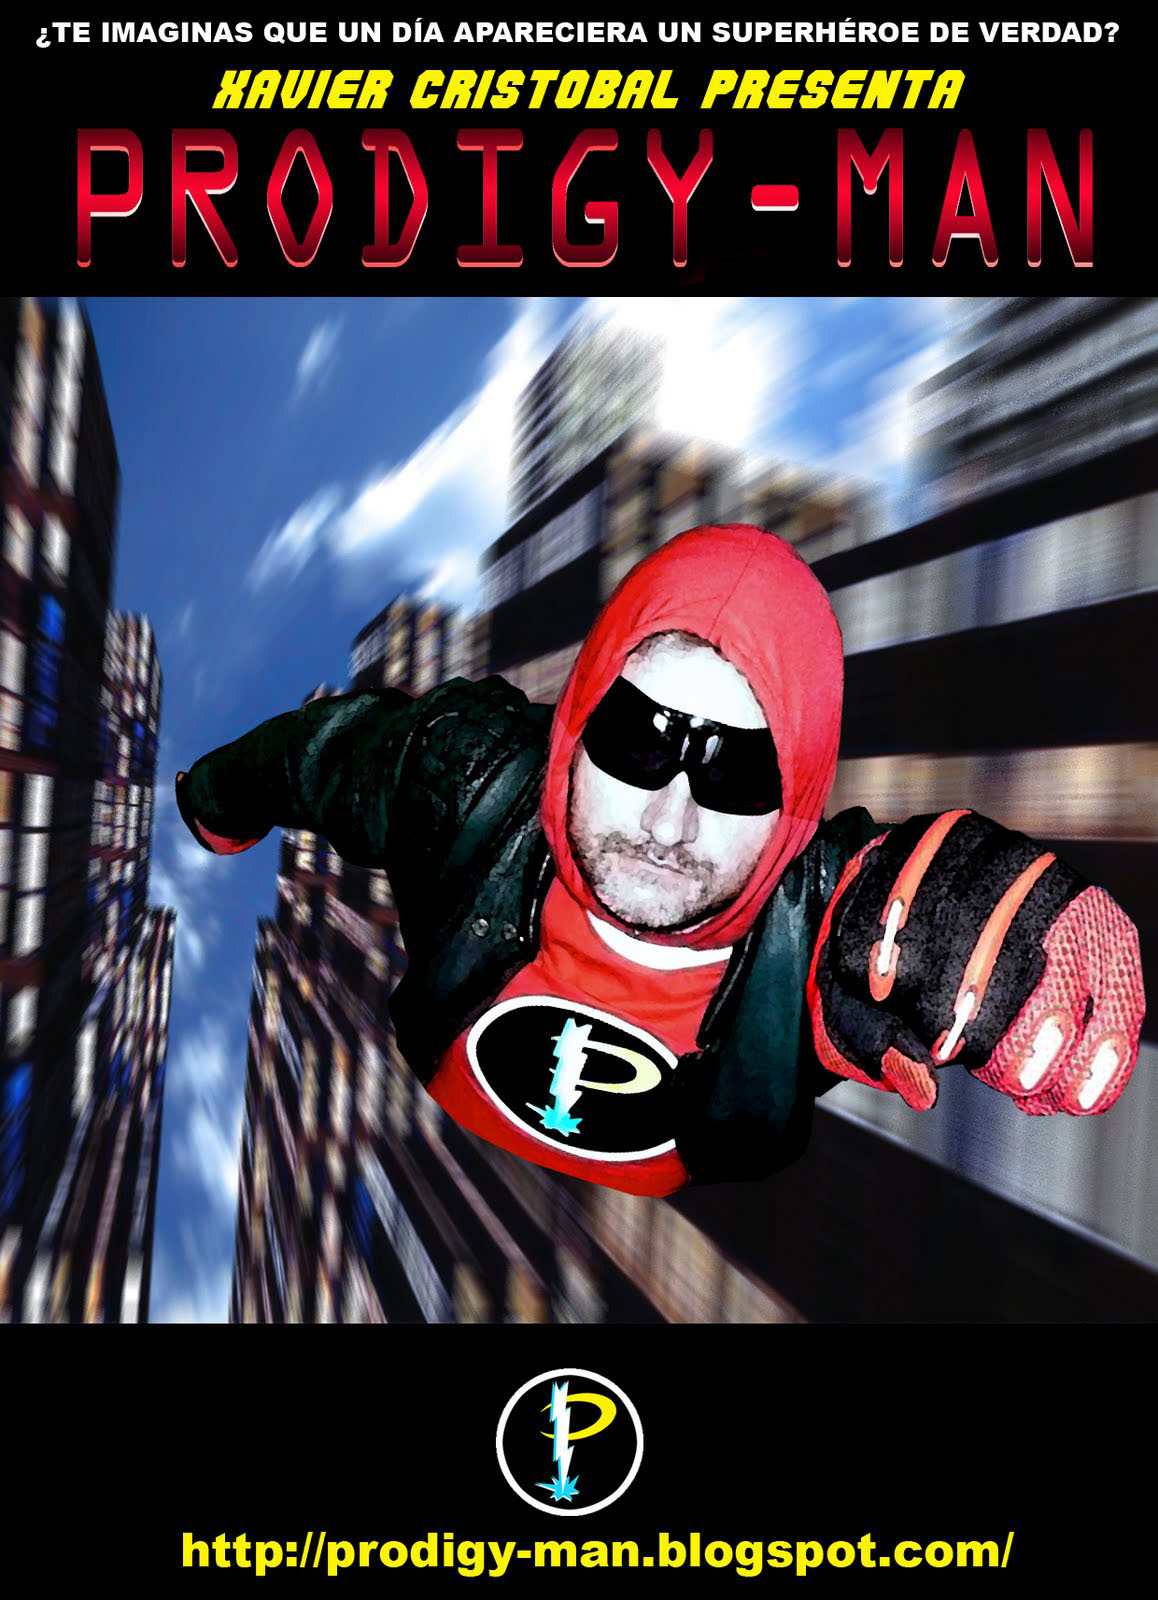 http://1.bp.blogspot.com/-SwZcuhCUKRM/T6t_m-8IFKI/AAAAAAAAW70/wsIdqprYUJw/s1600/Poster_Prodigy_man_OK_2.jpg